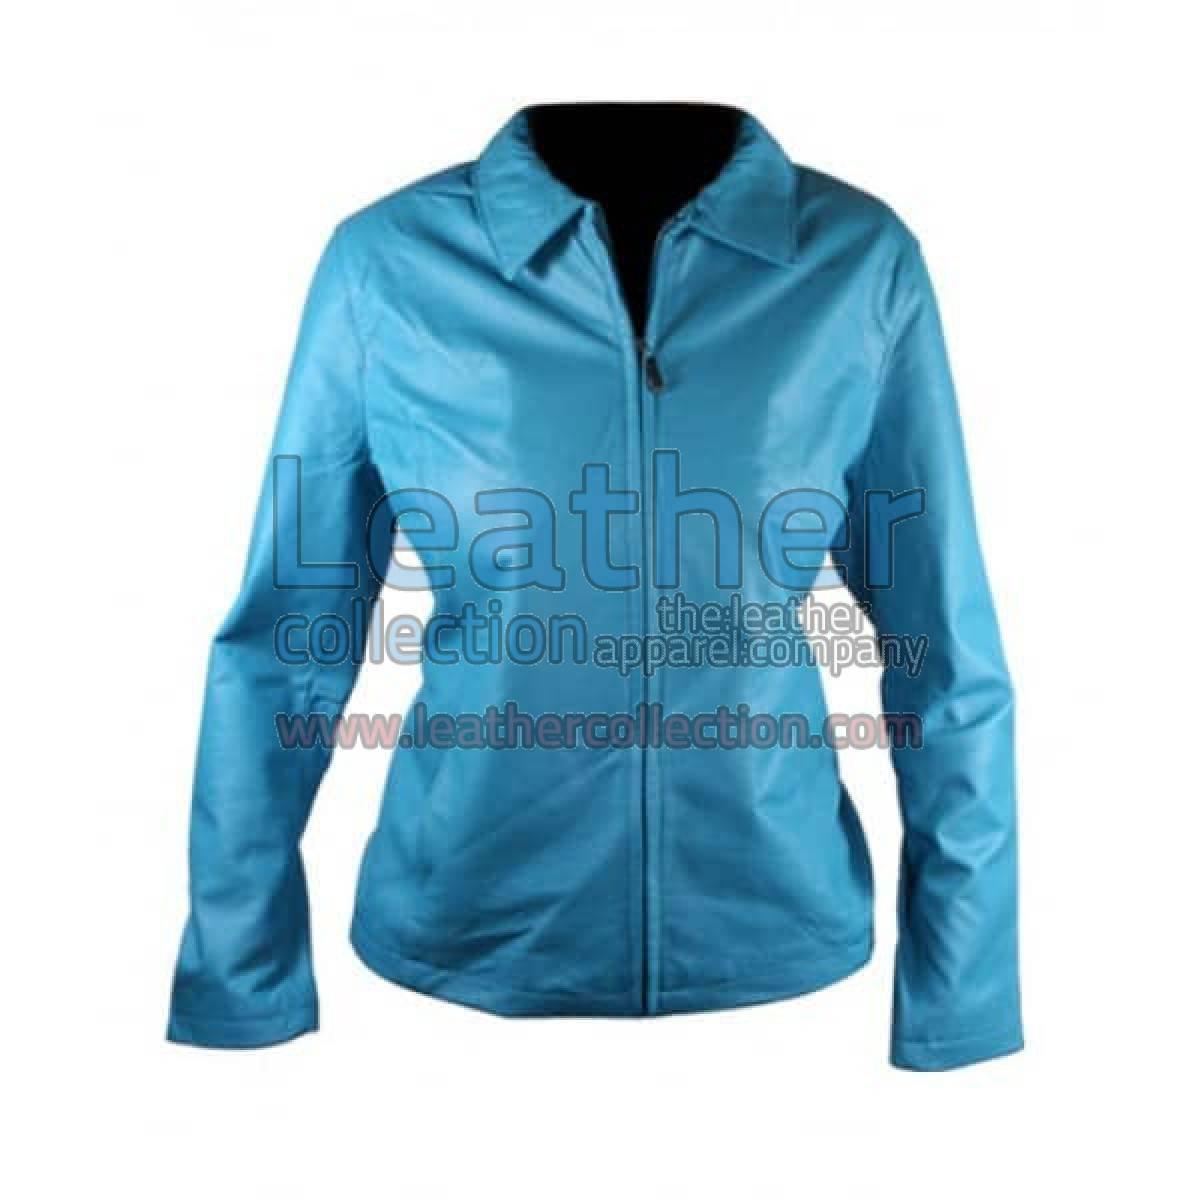 Classic Ladies Blue Leather Jacket